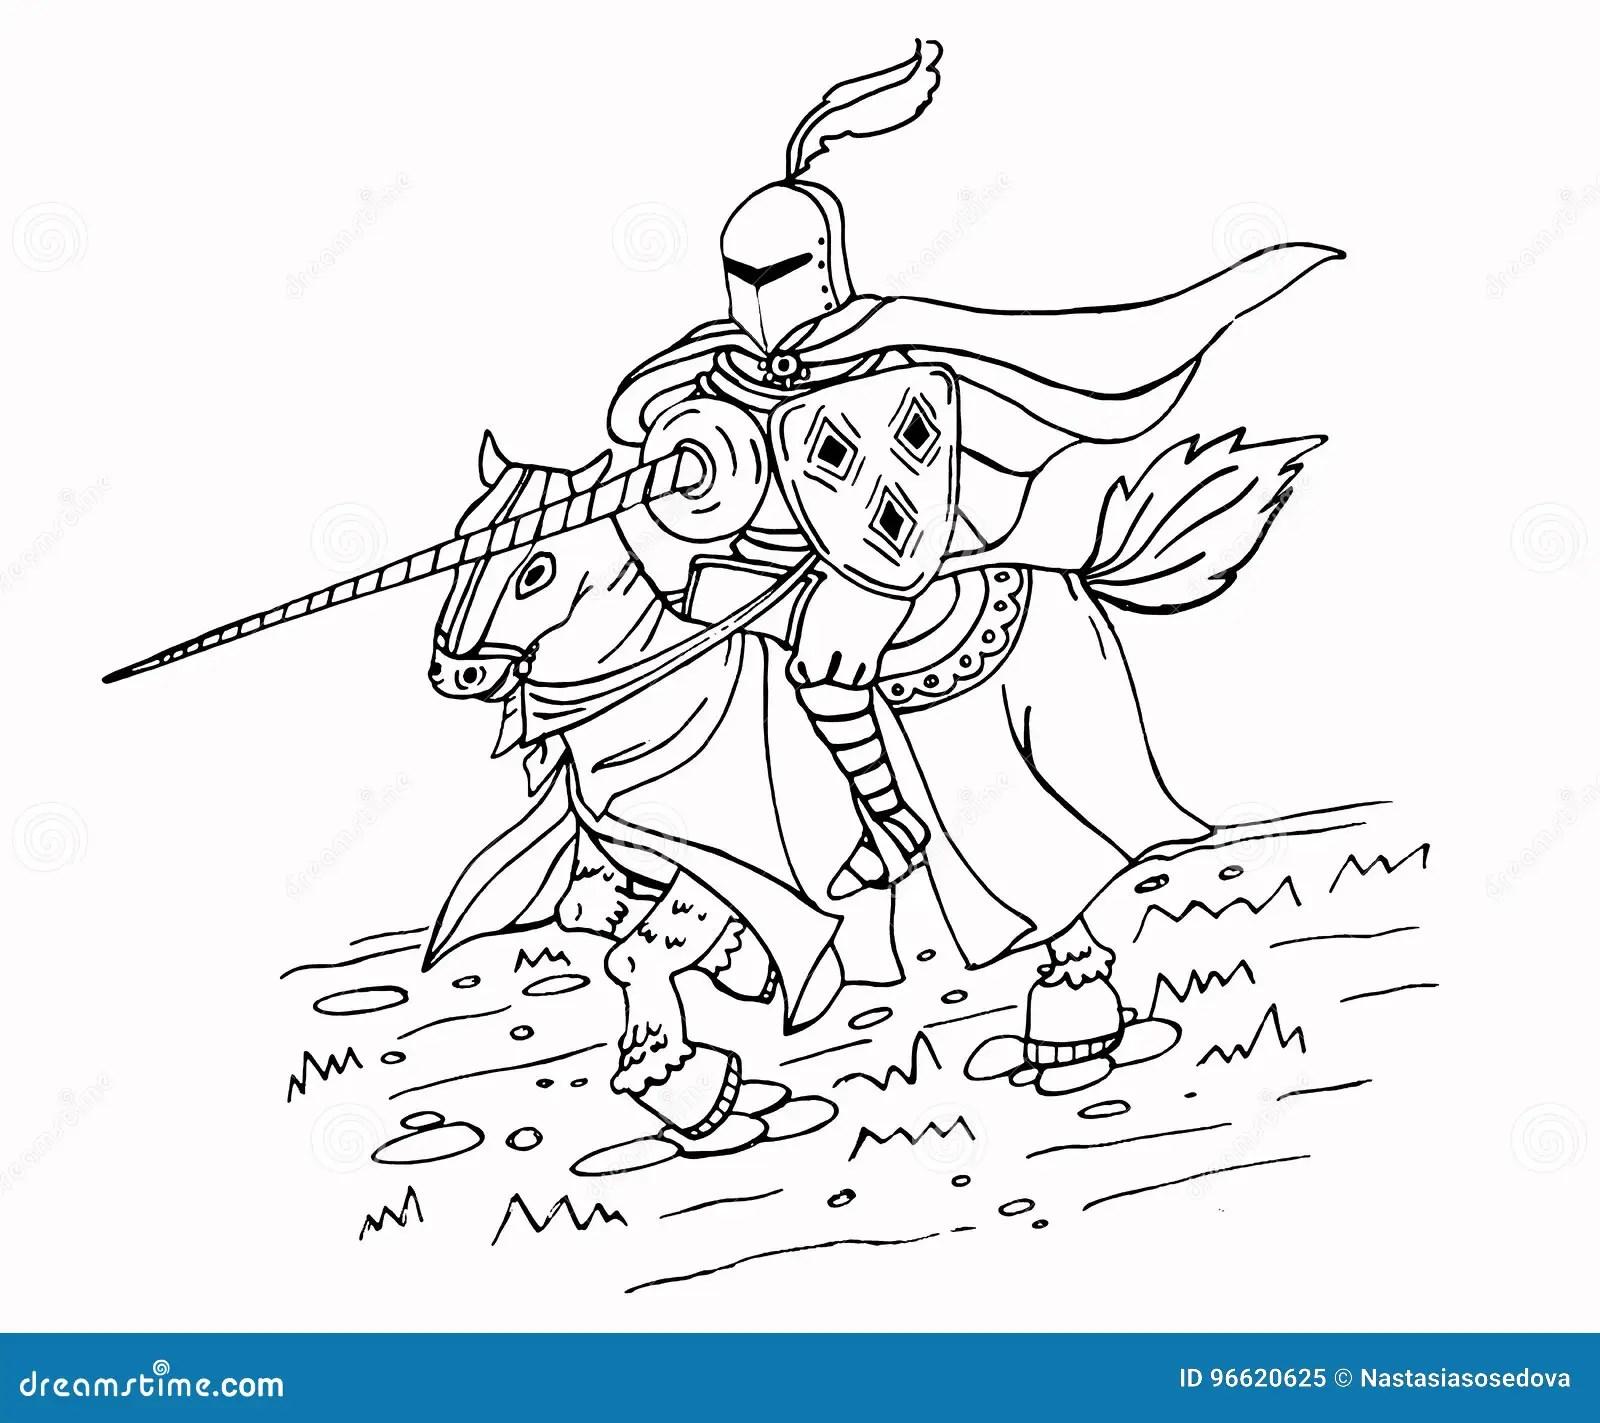 tags: #cartoon riding surfboard#cartoon jousting stick#cartoon people  jousting#medival sword fight cartoon#jousting cartoon images girl#2 knights  jousting